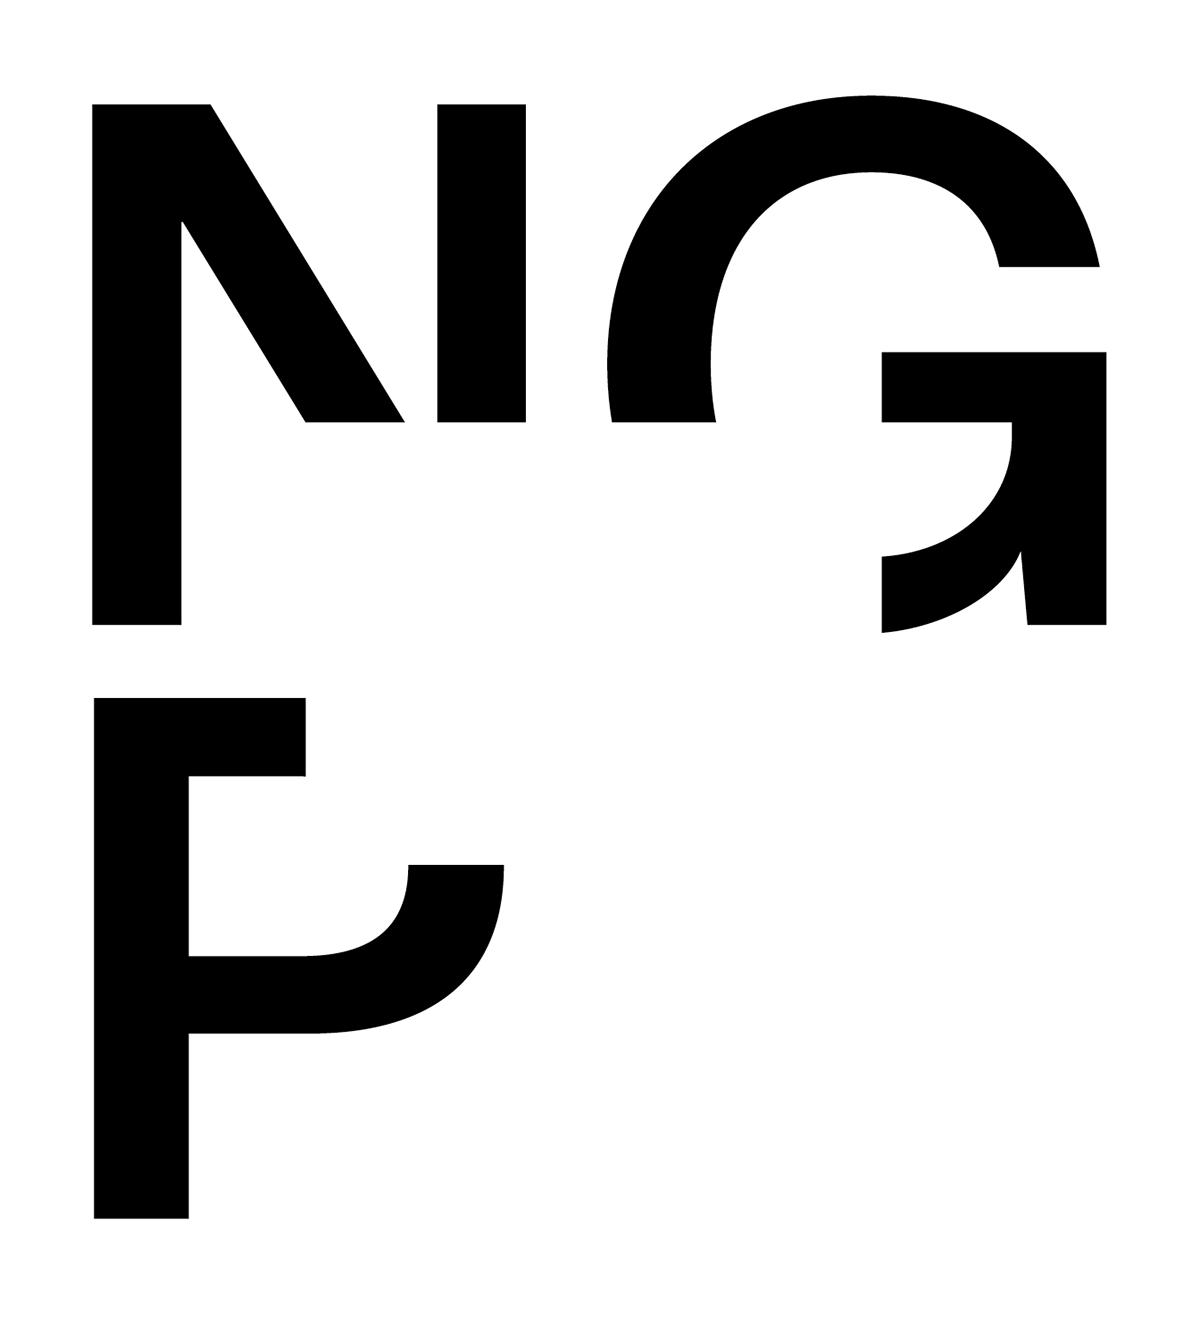 Studio Najbrt Wins the Re-Design of the National Gallery Prague Visual Identity